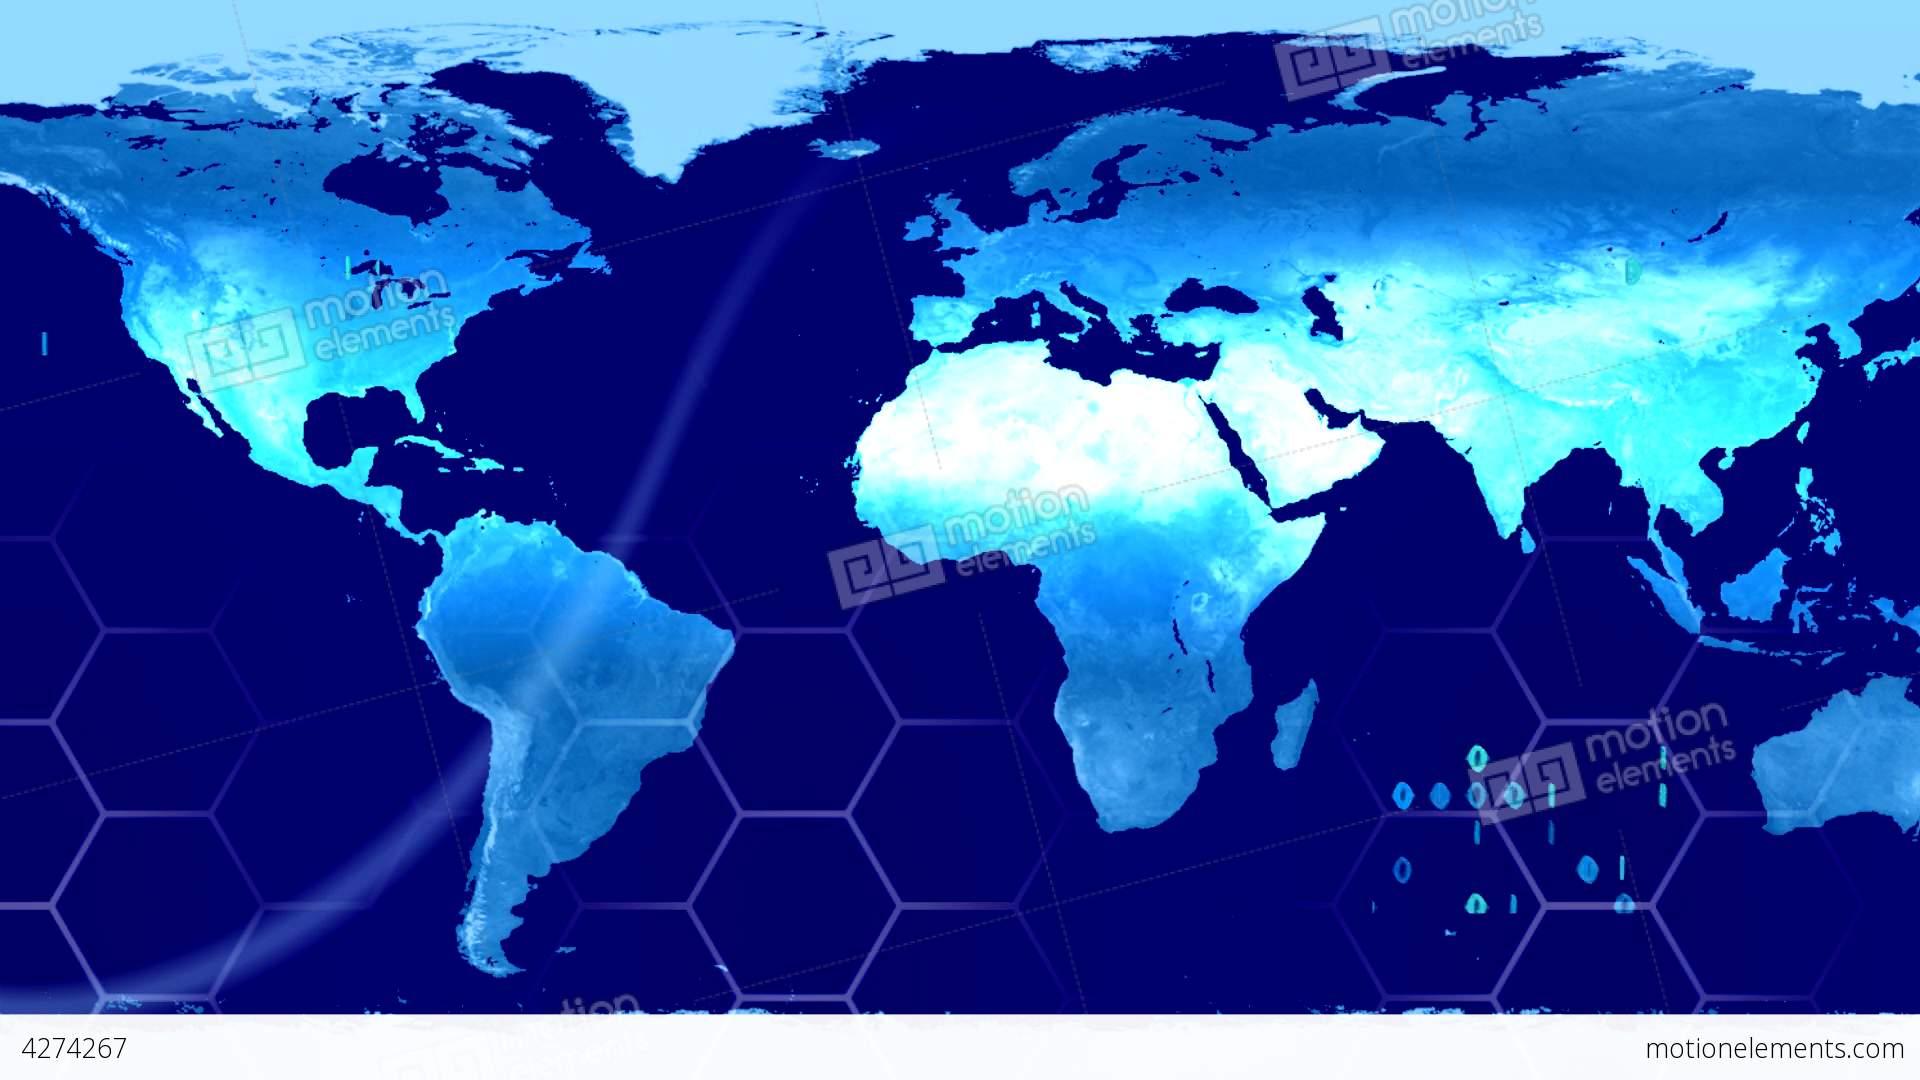 World map high tech digital satellite data view wa stock animation world map high tech digital satellite data view wa stock video footage gumiabroncs Gallery